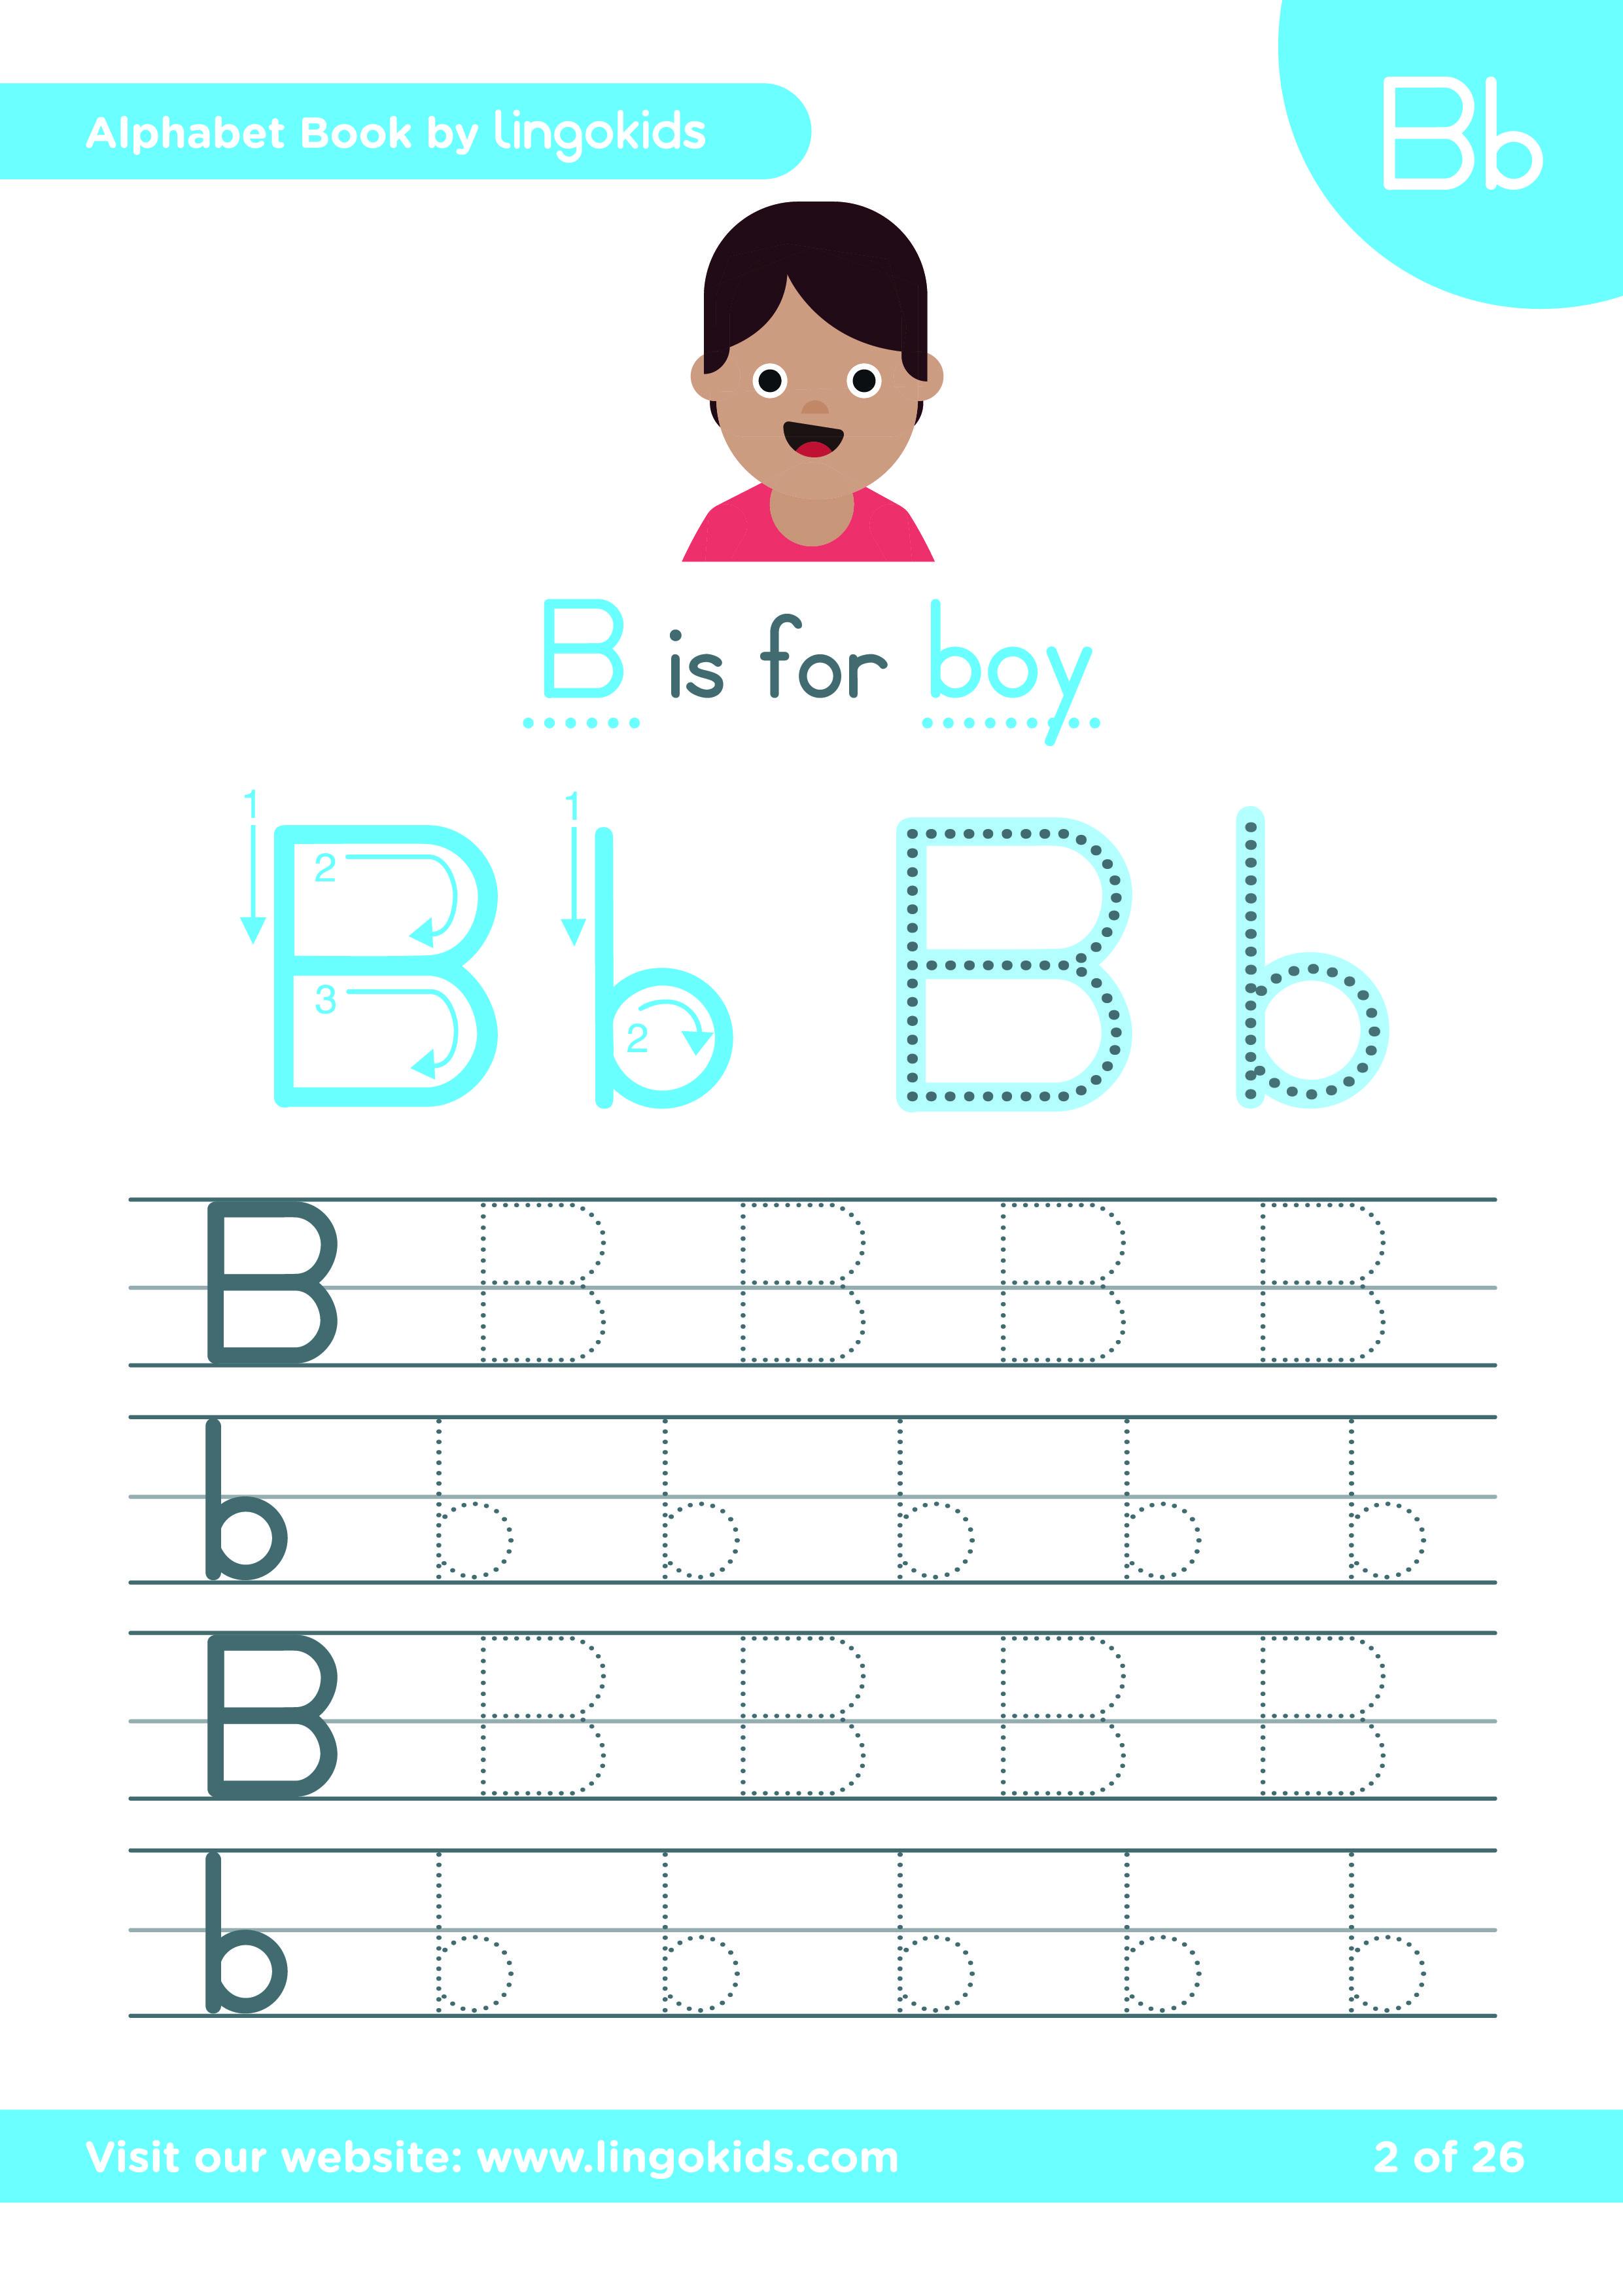 Alphabet In English With Audio English Activities For Kids Learning English For Kids Alphabet Preschool [ 3509 x 2481 Pixel ]